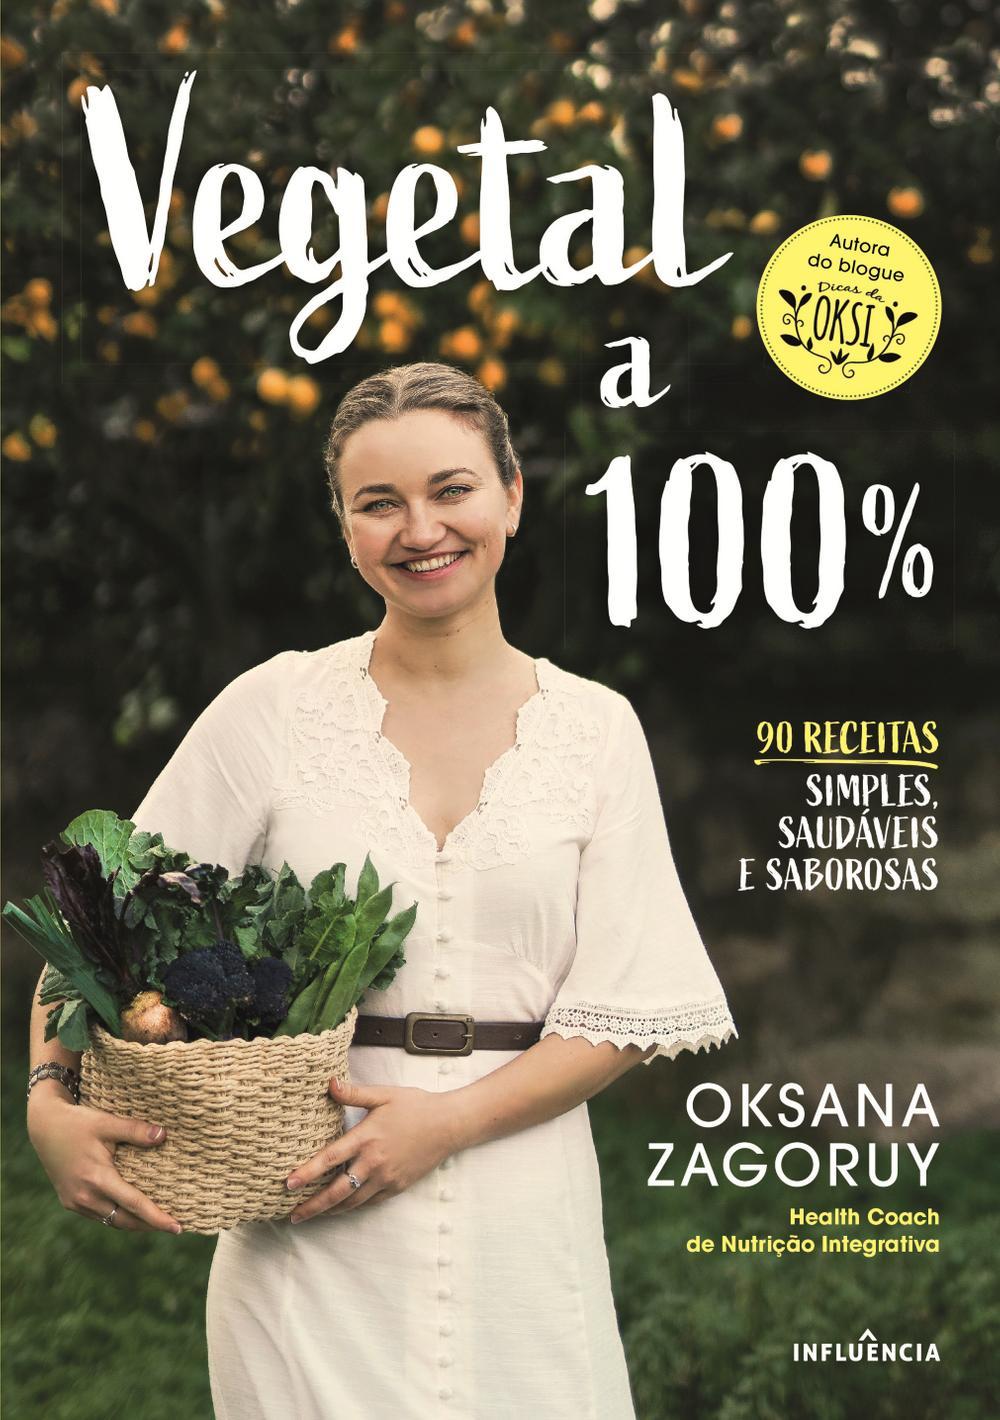 Vegetal a 100% de Oksana Zagoruy